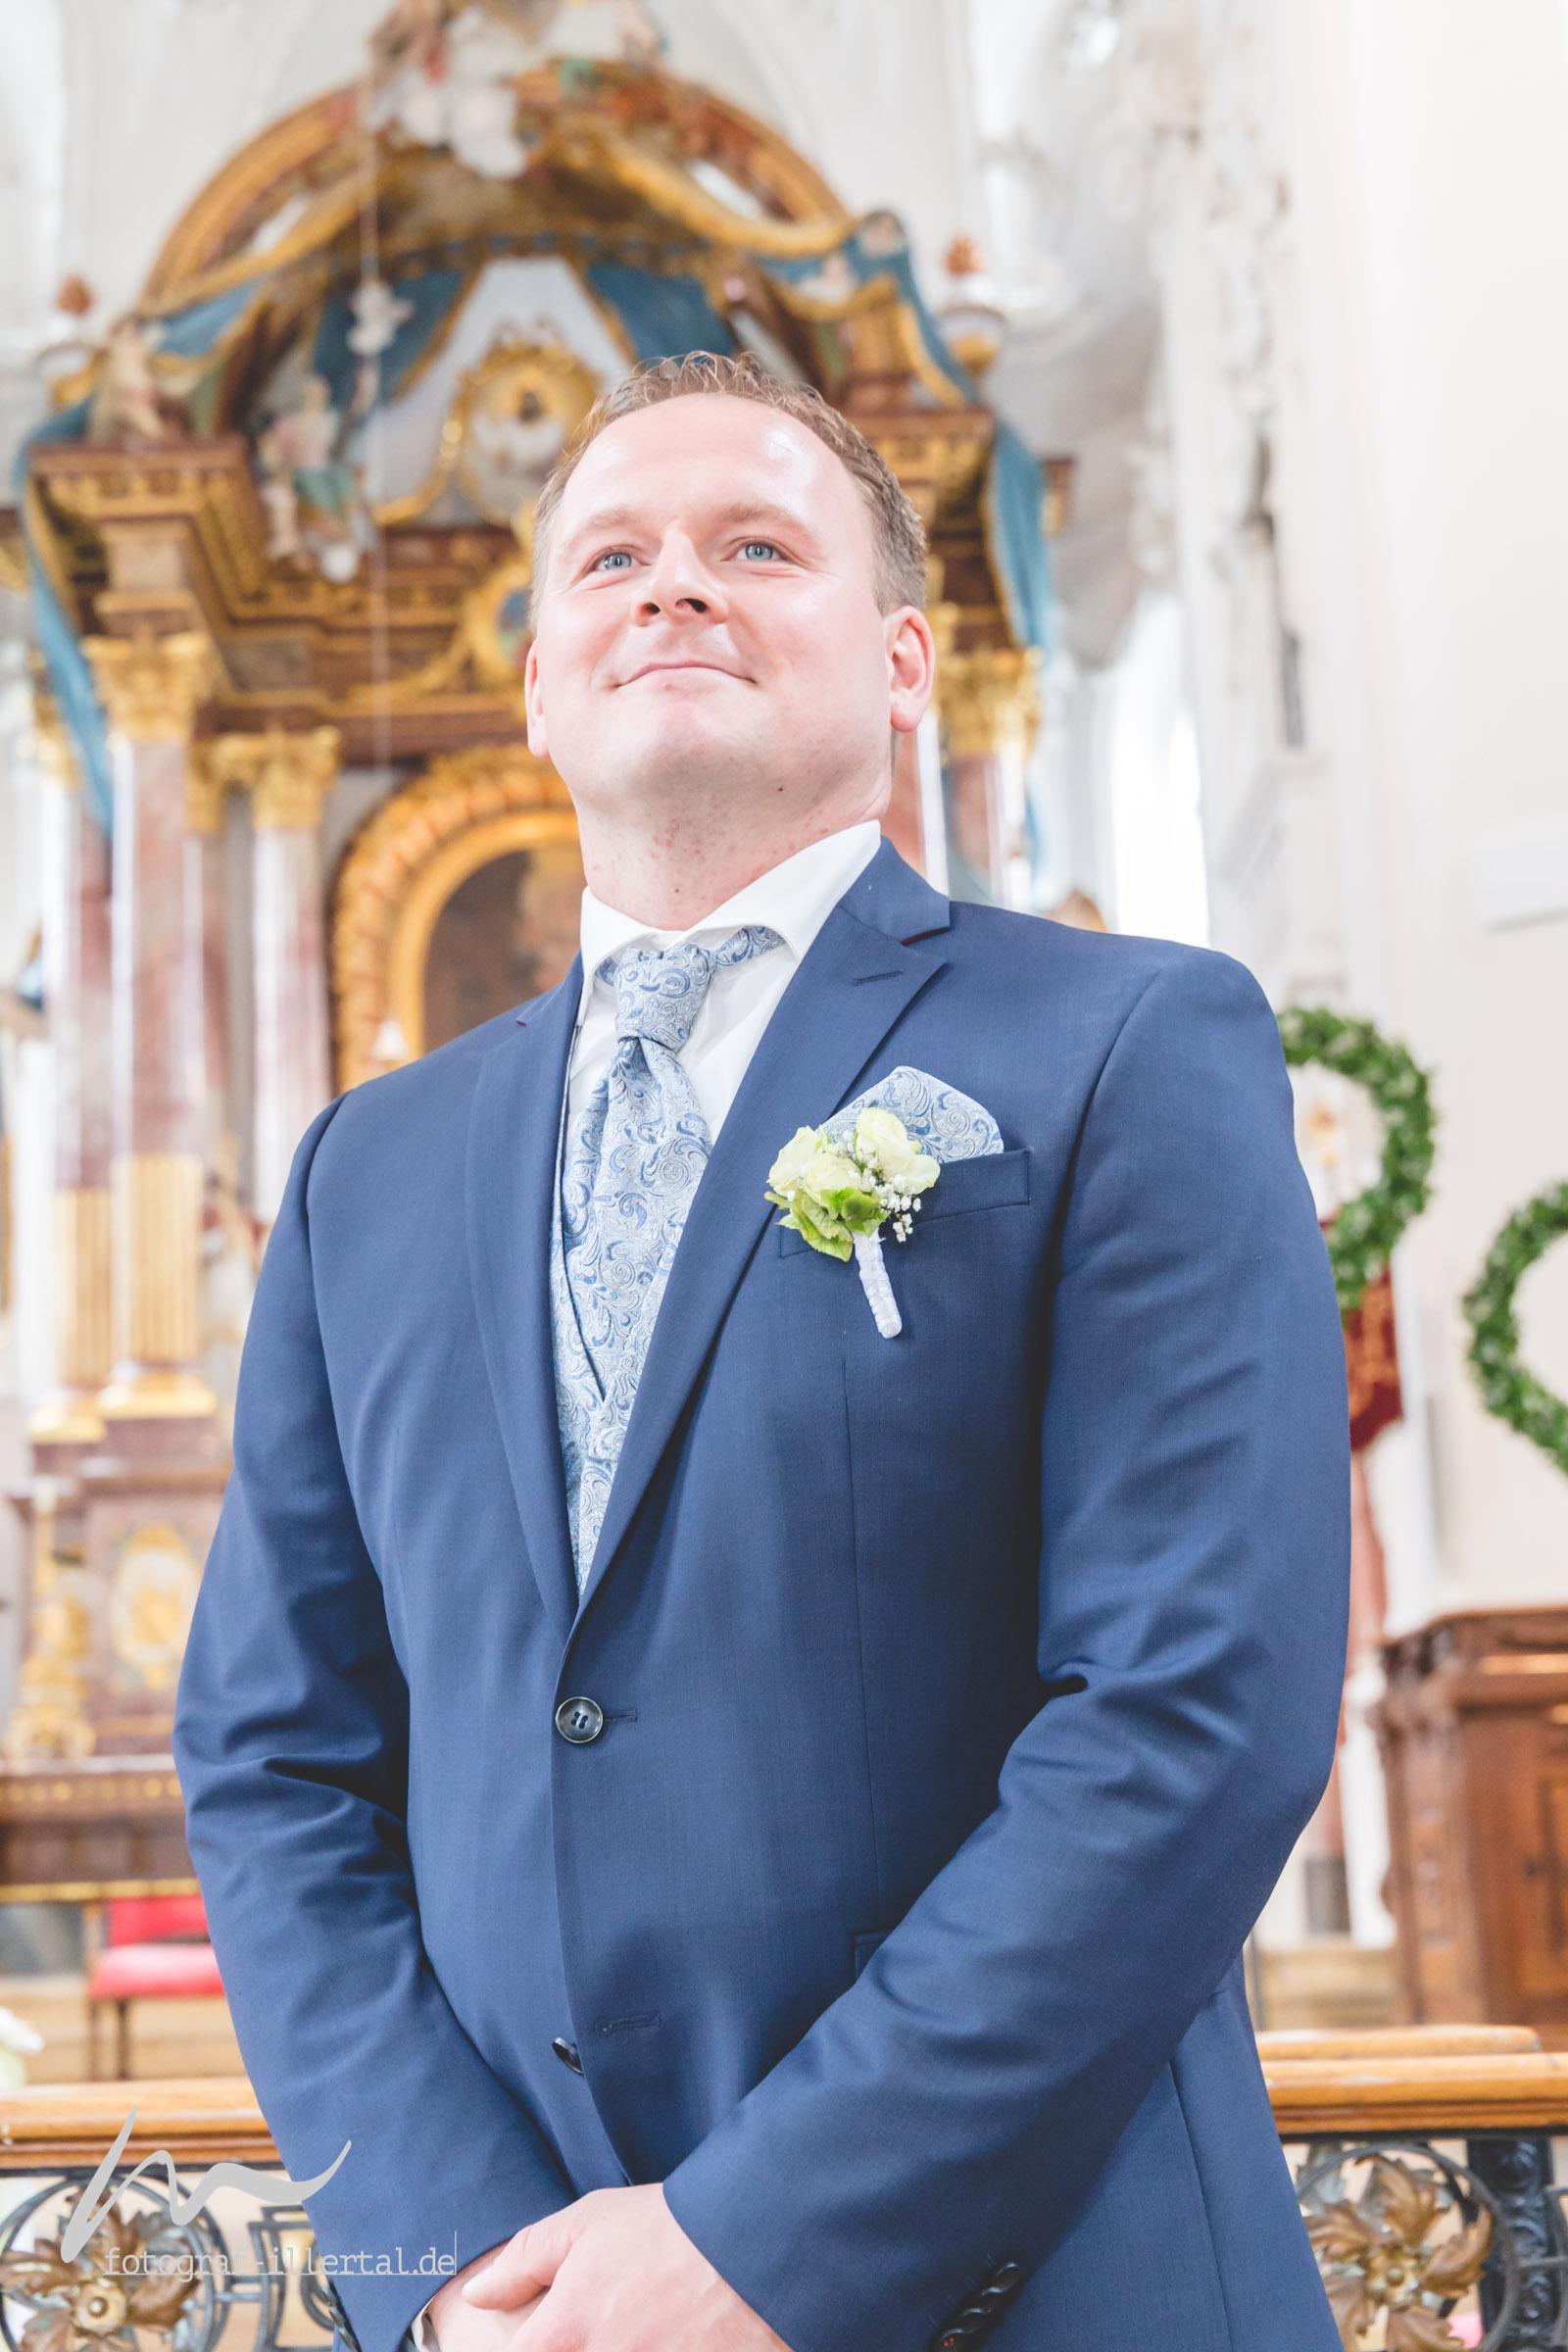 Fotograf Illertal-Christian Miller-Hochzeitsfotografie-_MG_4075